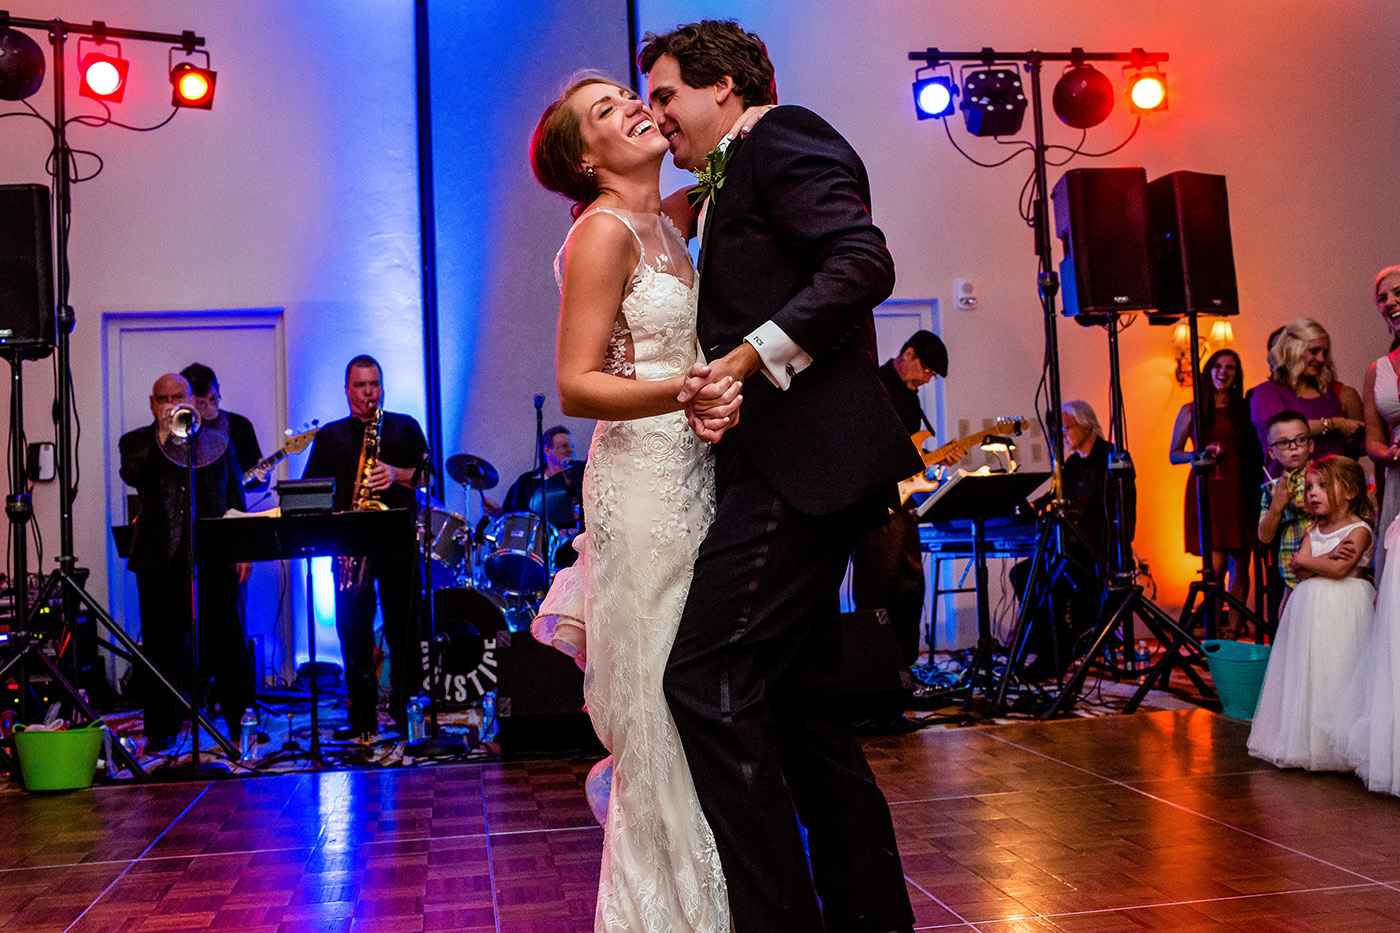 LaPosada-wedding-SantaFe-NewMexico-Carolyn-Tyler-158